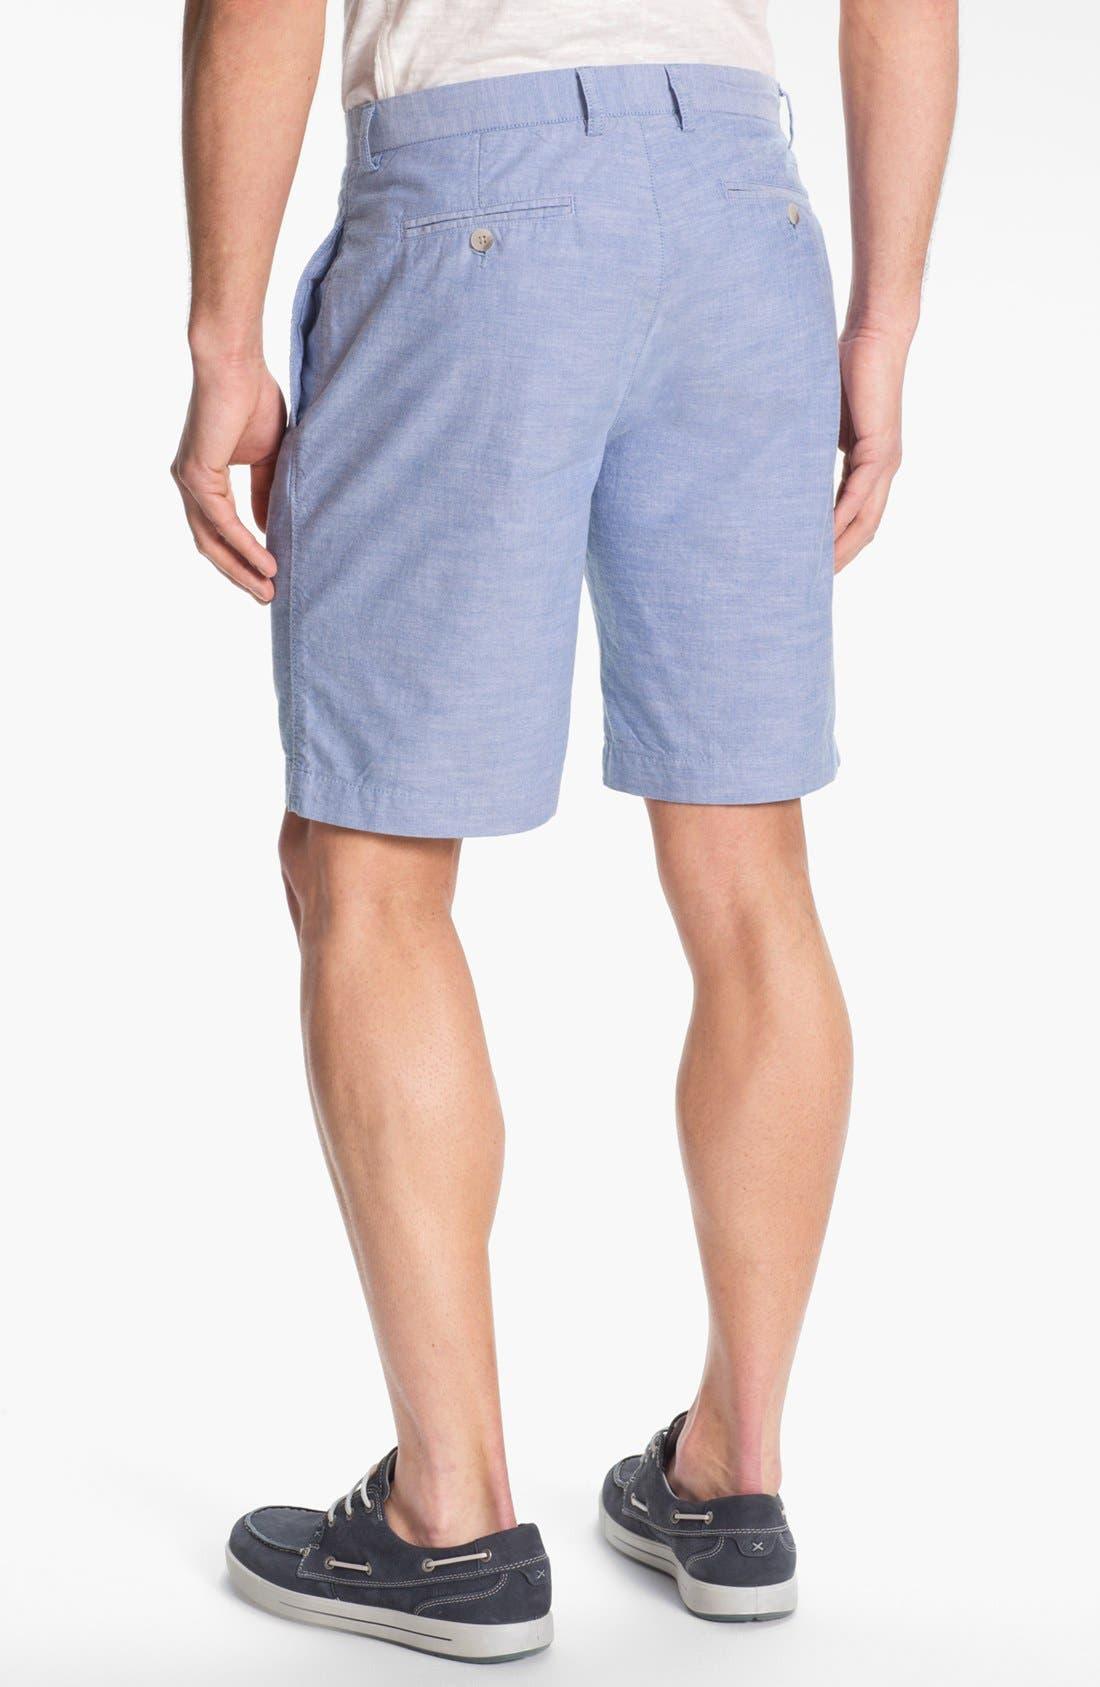 Alternate Image 2  - Maker & Company 'Mucker' Oxford Shorts